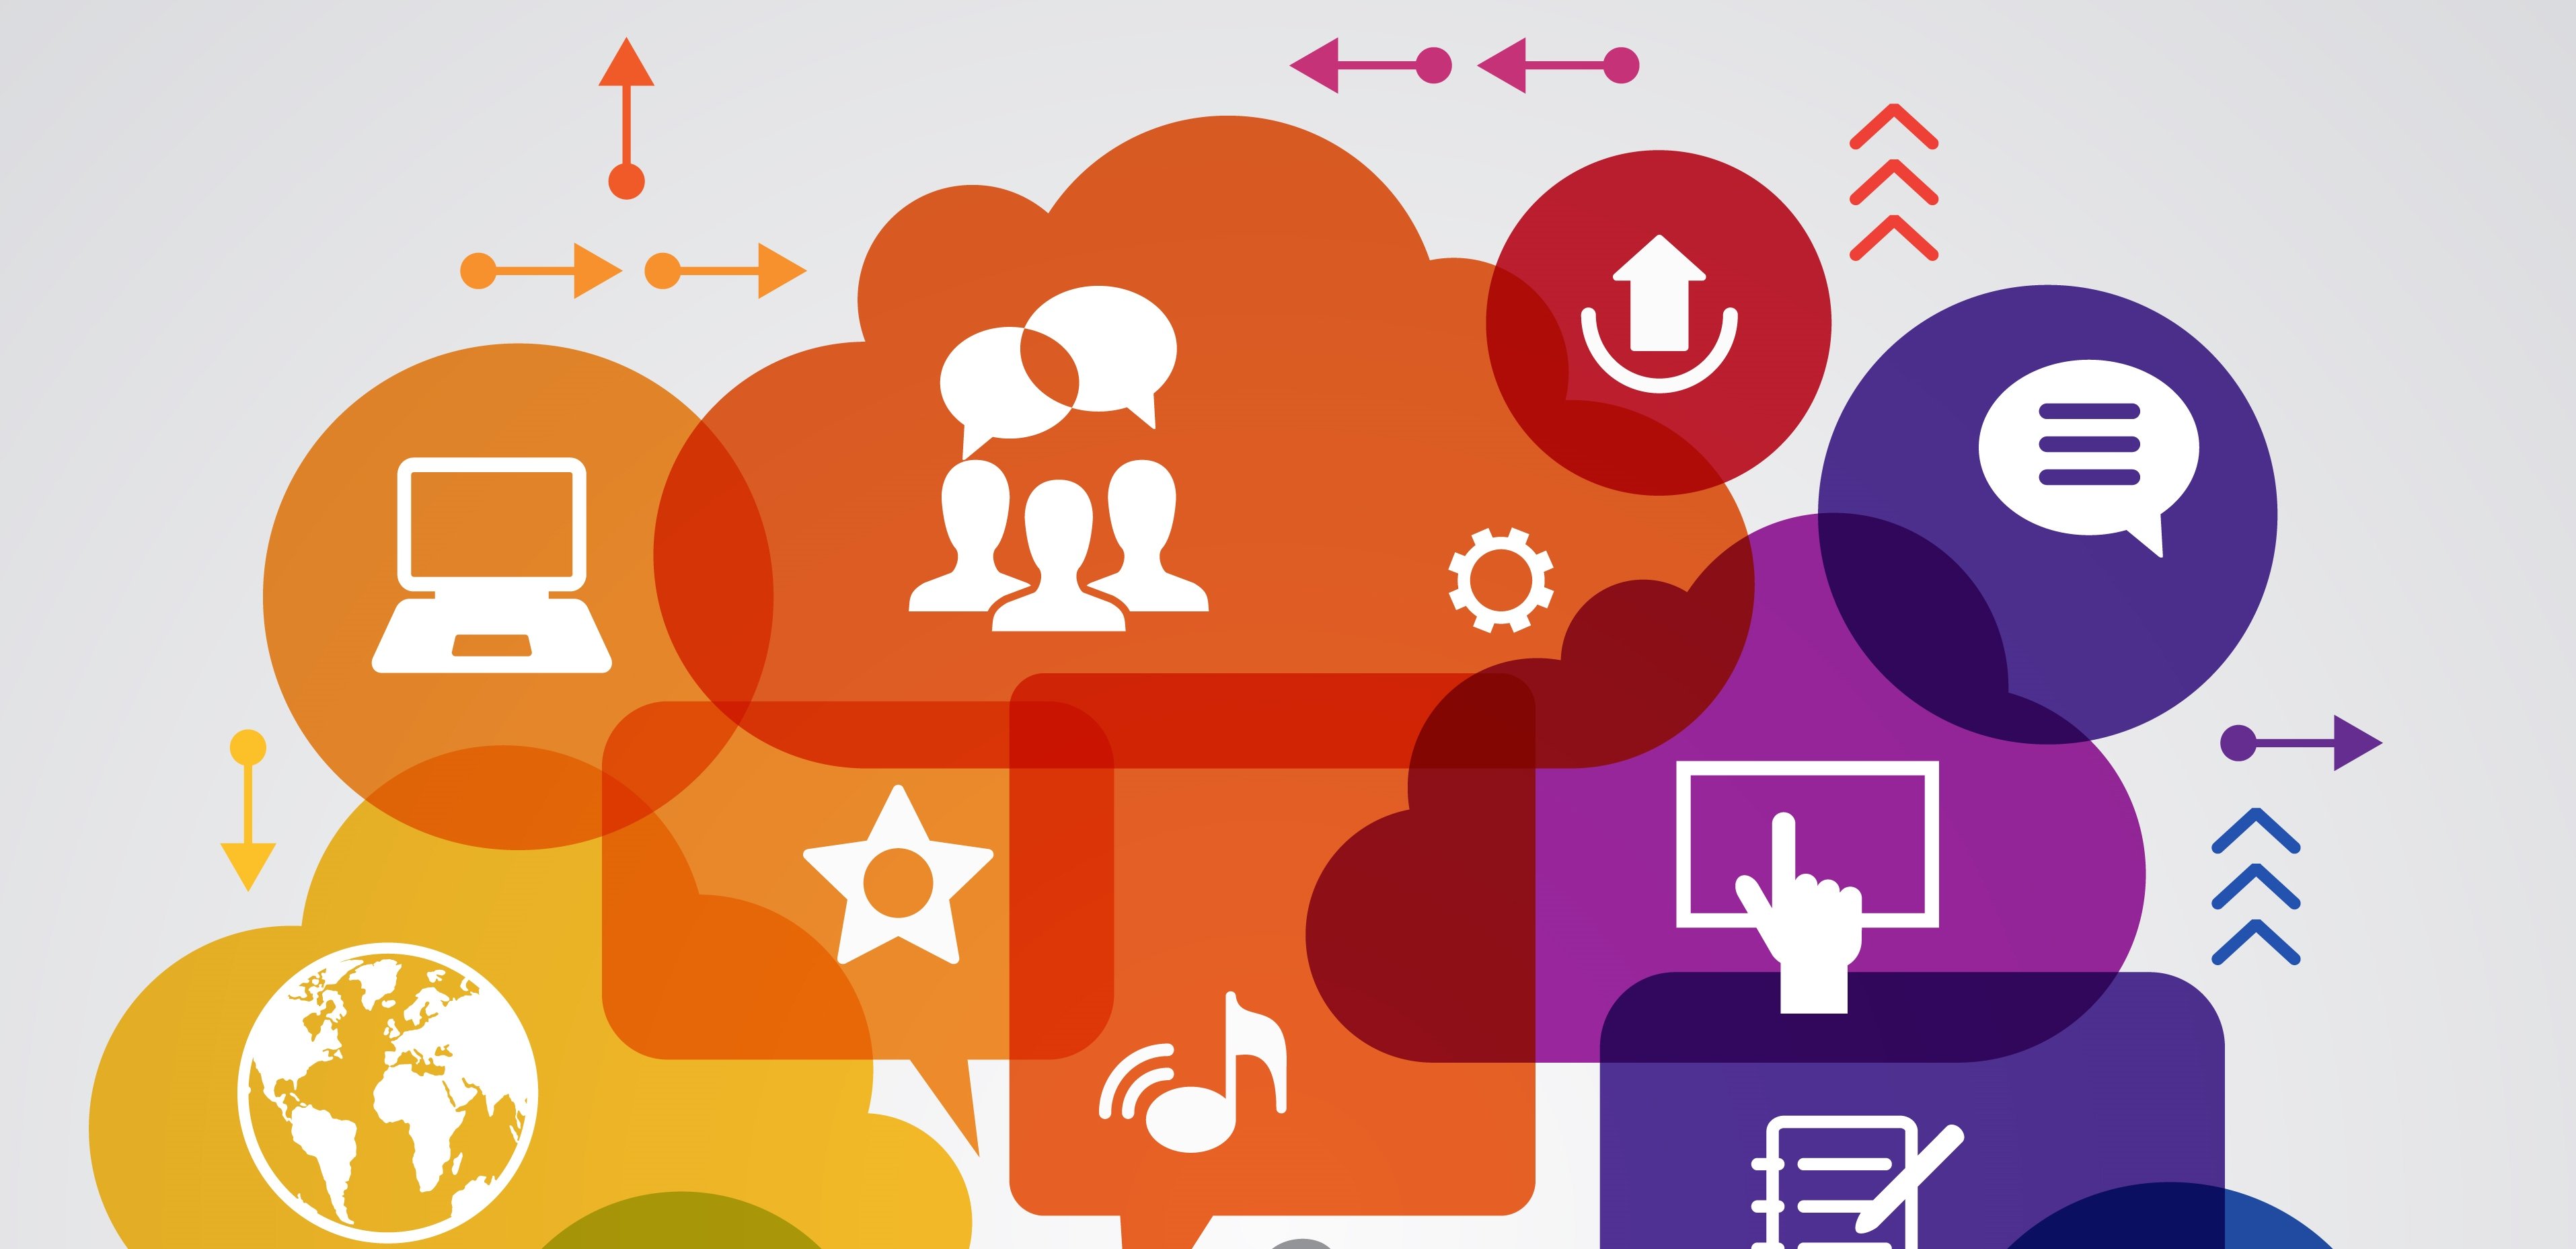 6 career change networking tips flexjobs